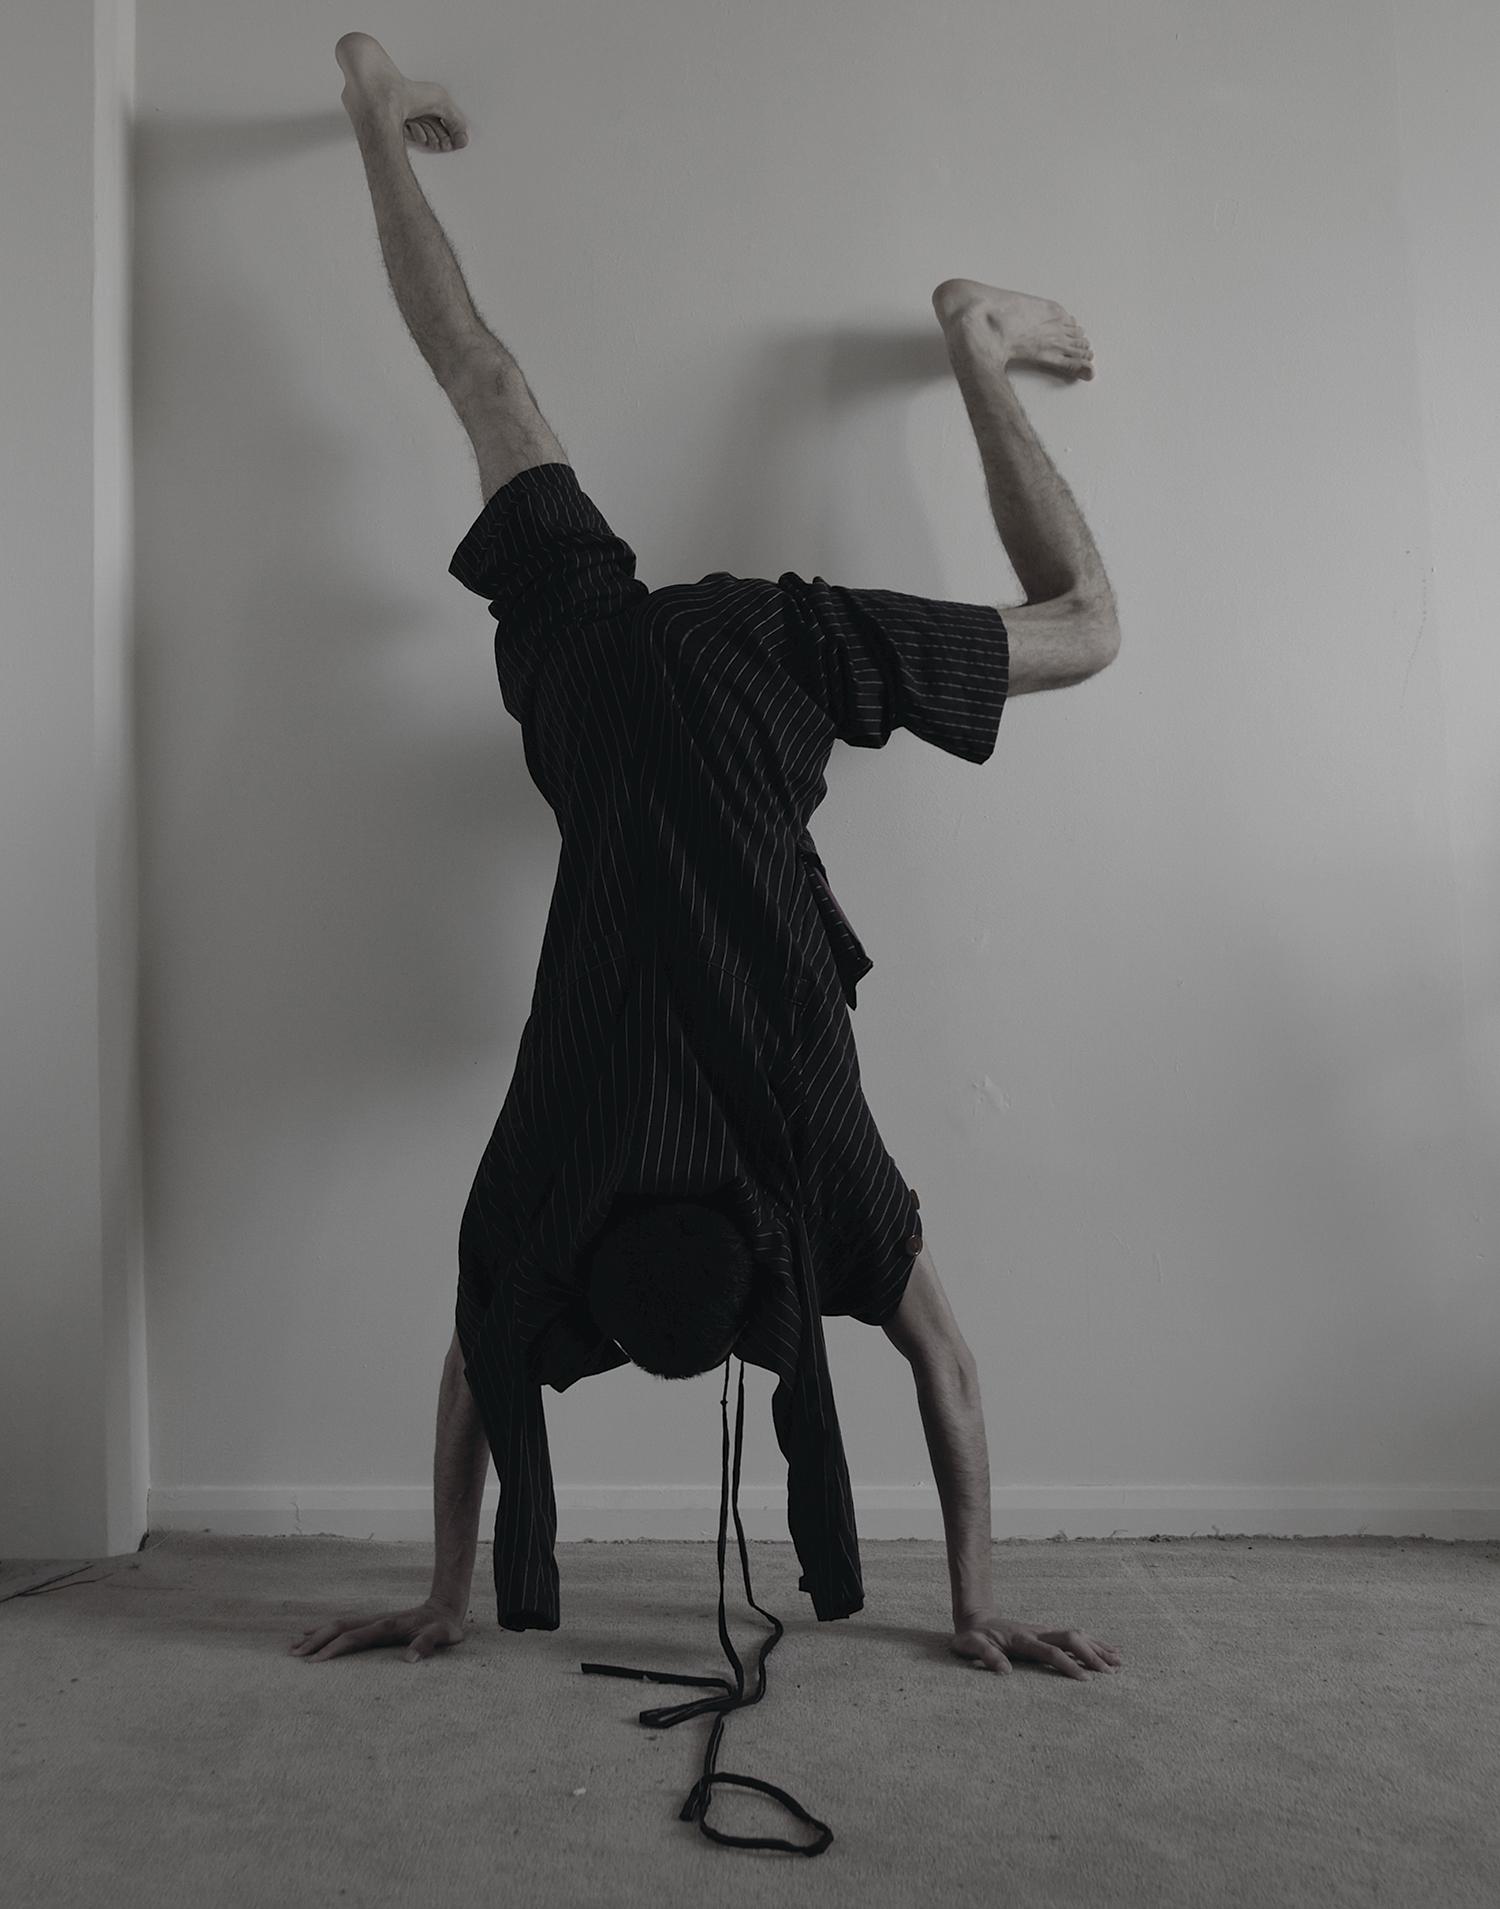 Jumpsuit by Andreas Kronthaler for Vivienne Westwood.